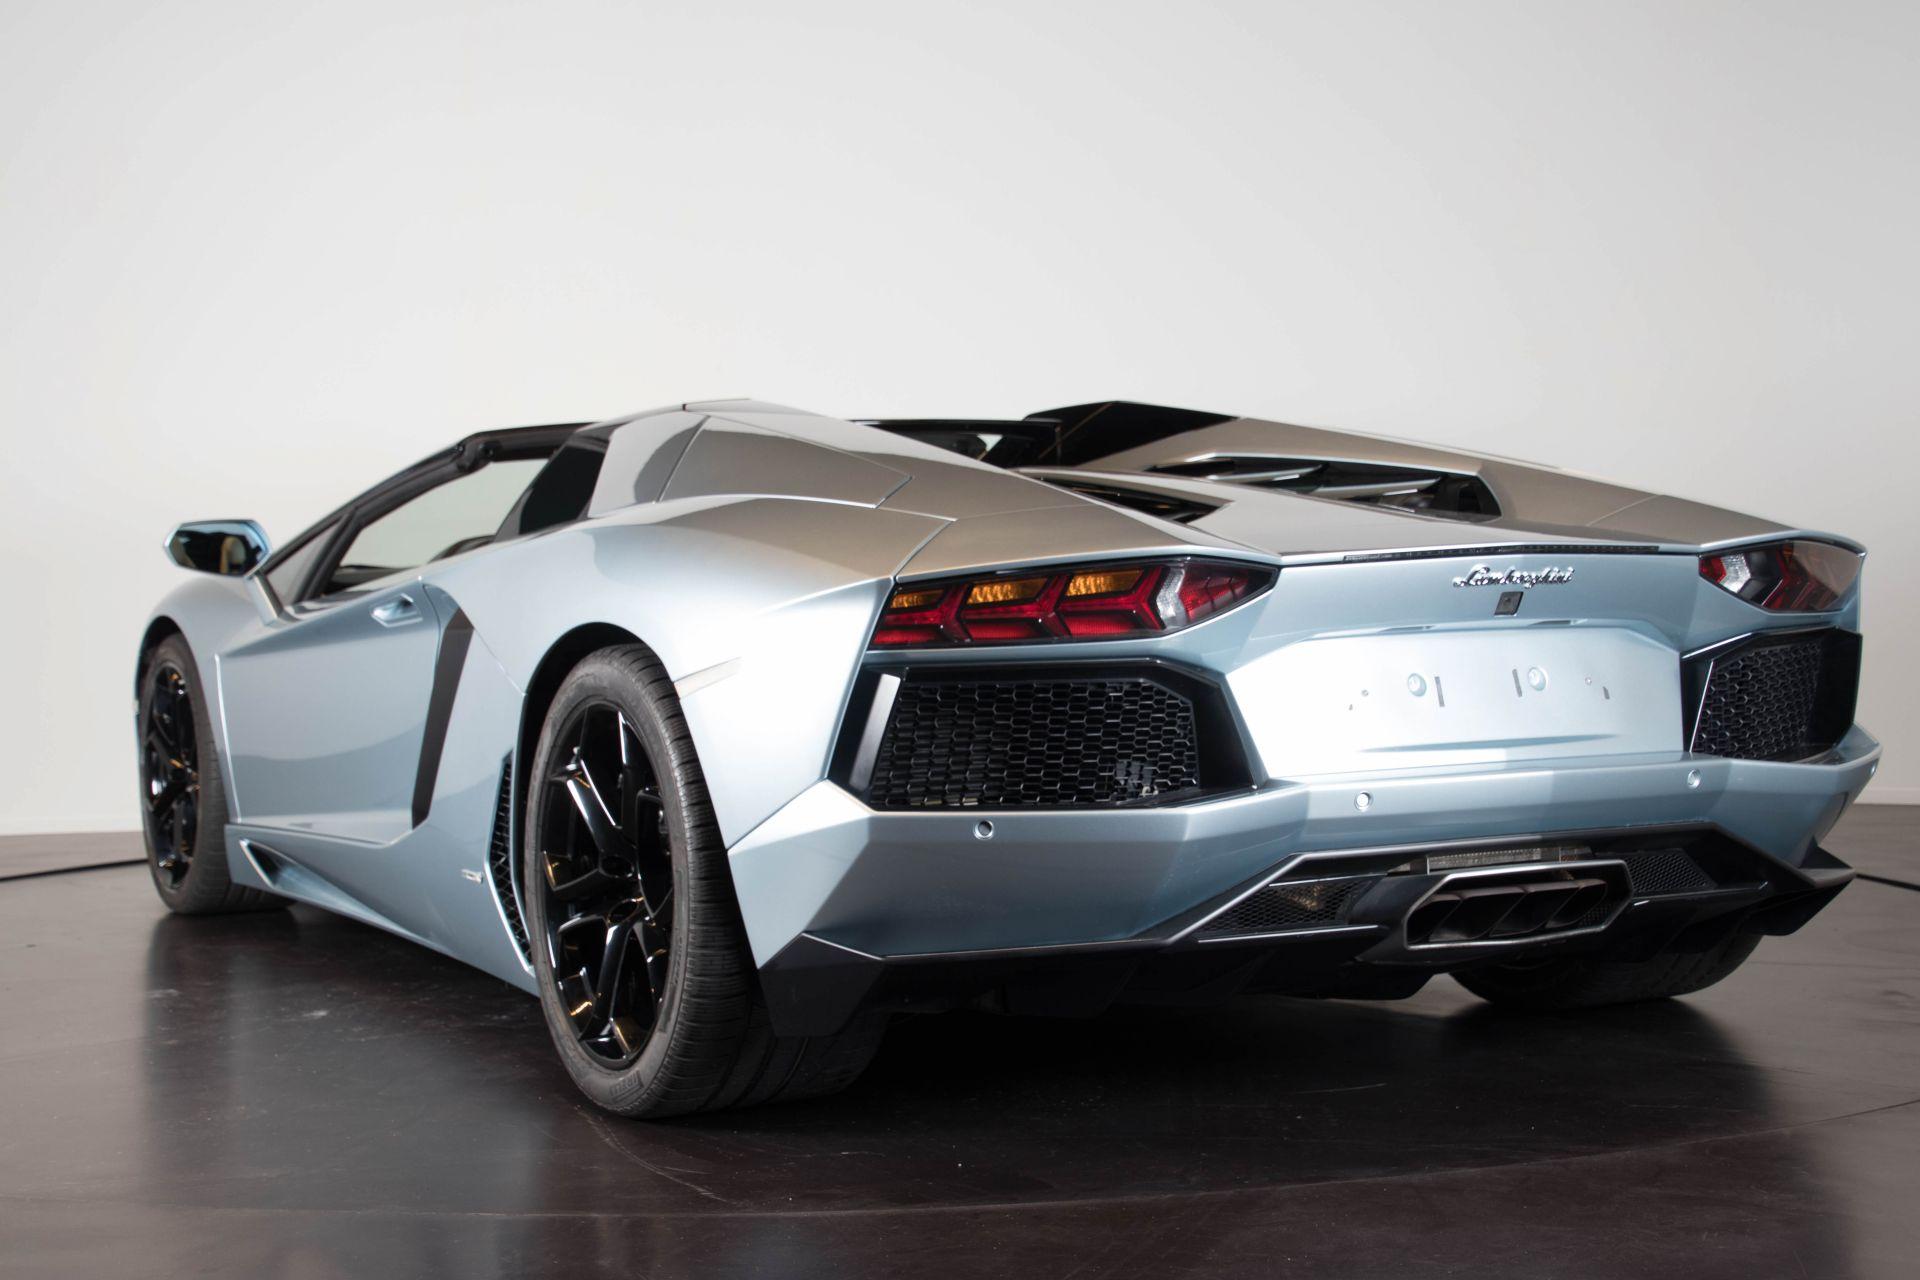 2014 Lamborghini Aventador Roadster  3800